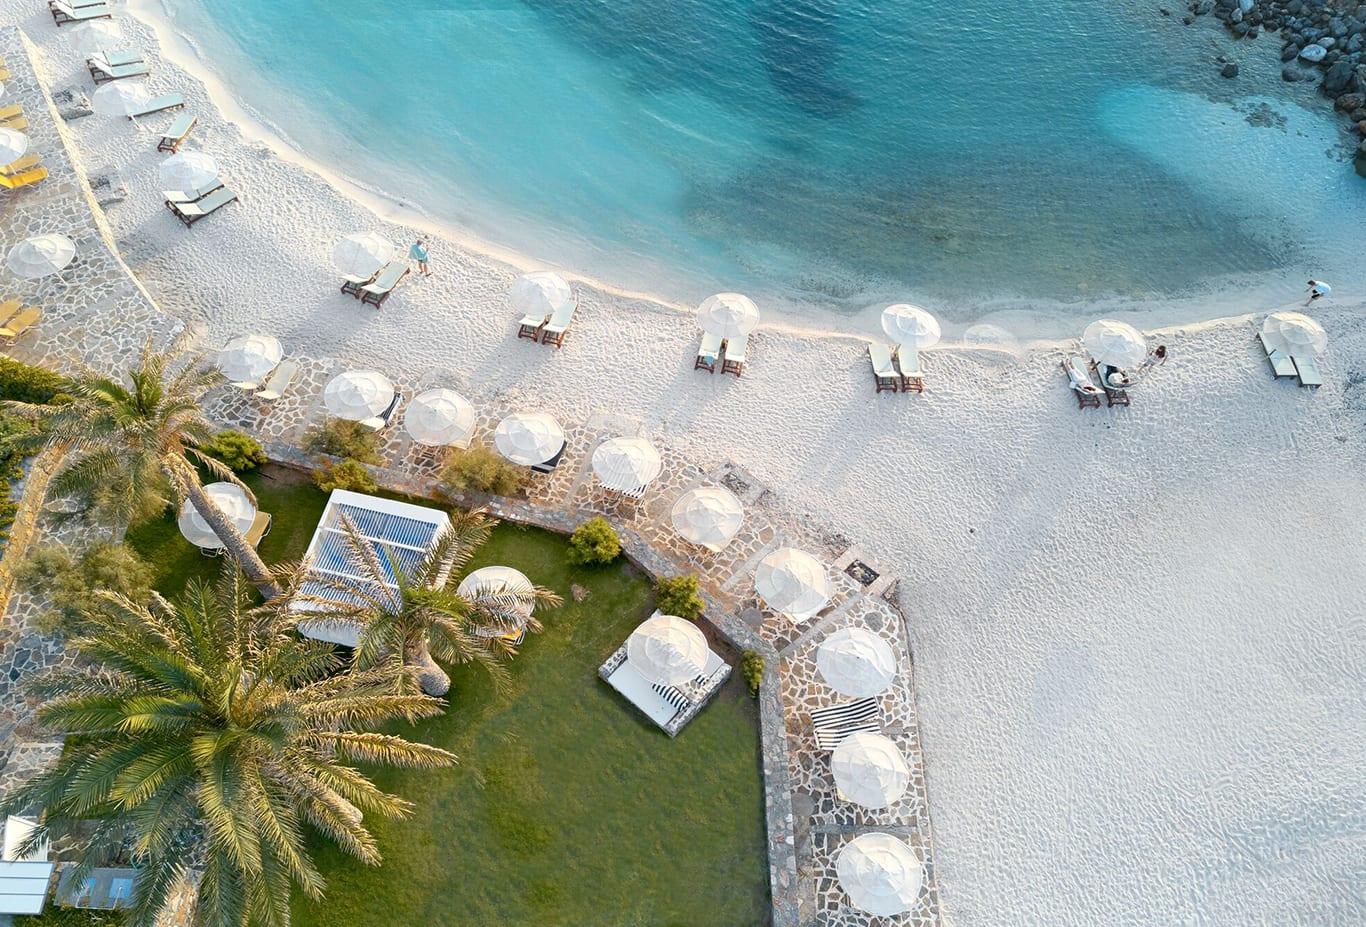 Radisson Blue Beach Resort Milatos, Crete